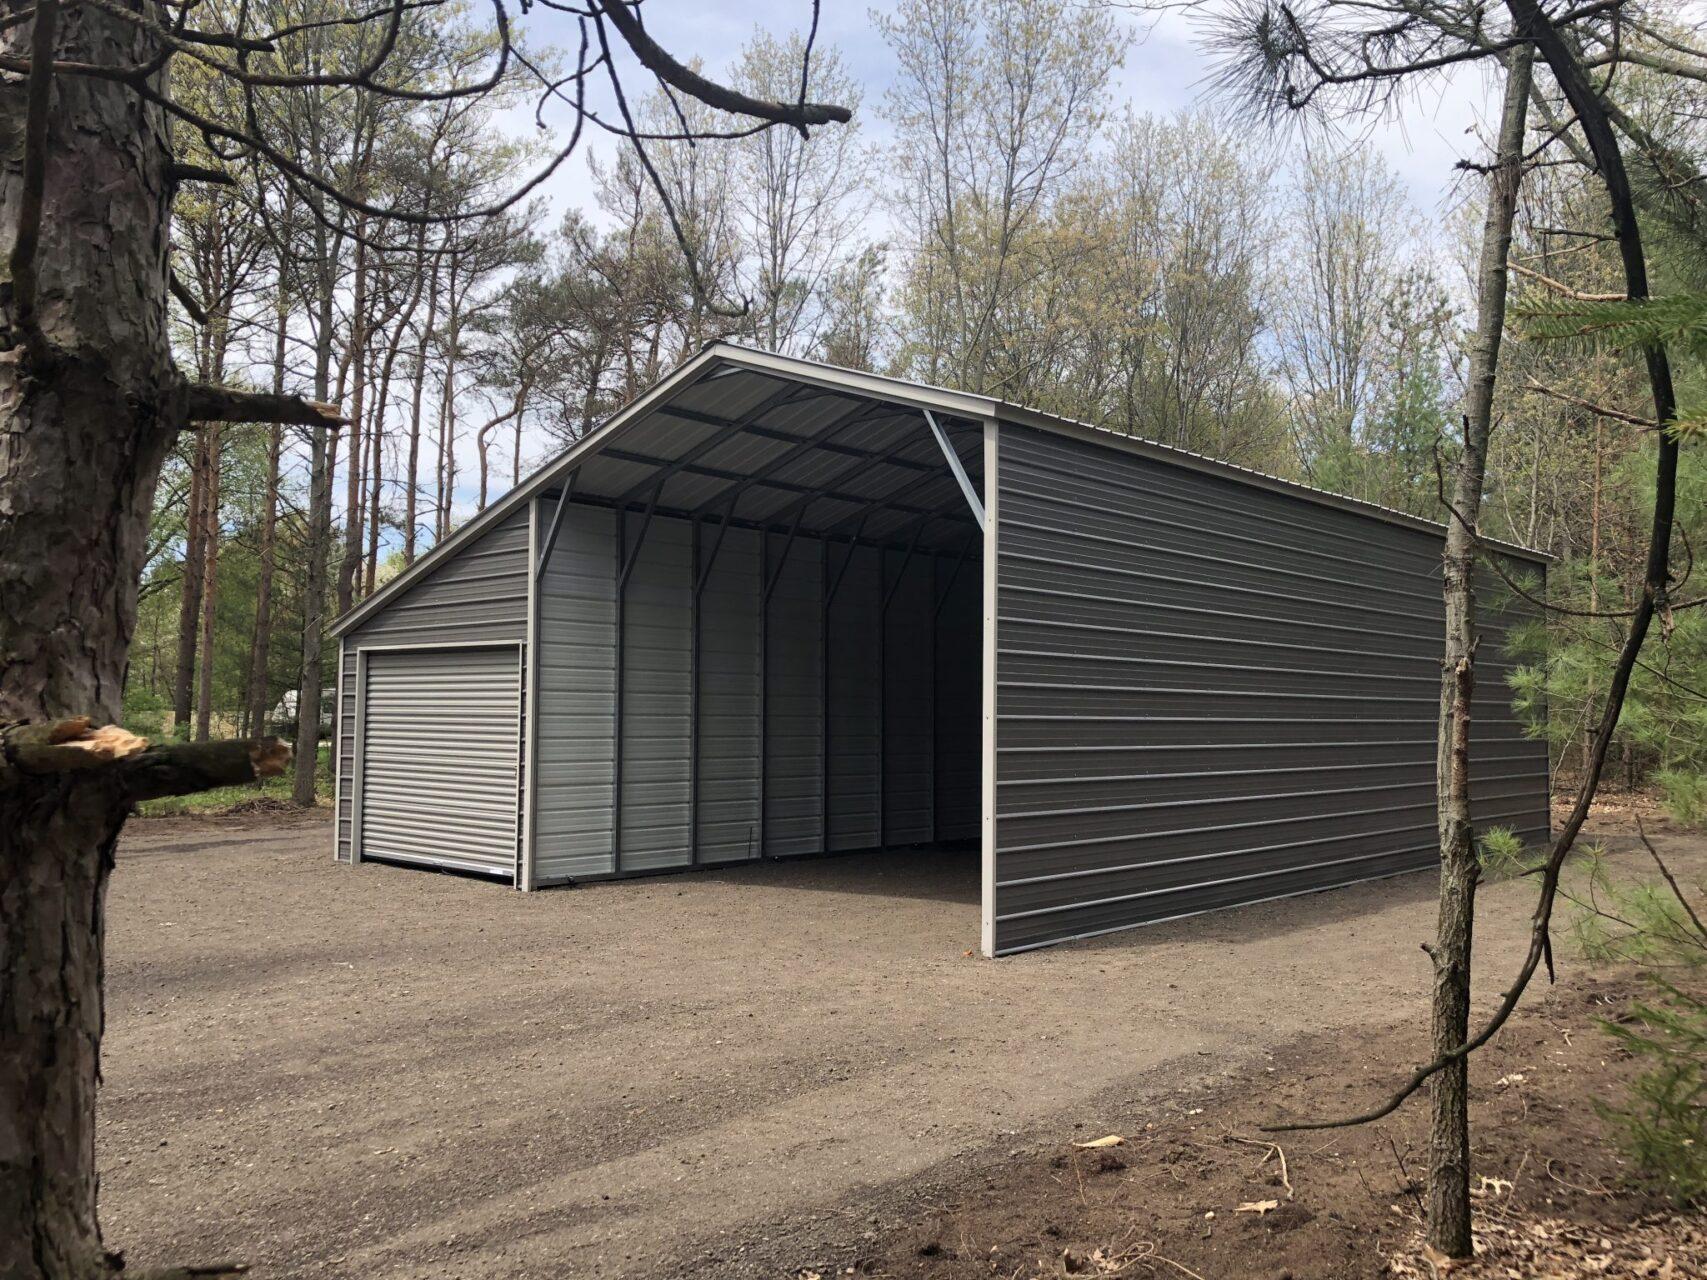 30x40x12-8 RV Carport with Lean To Storage in Fruitport, Michigan